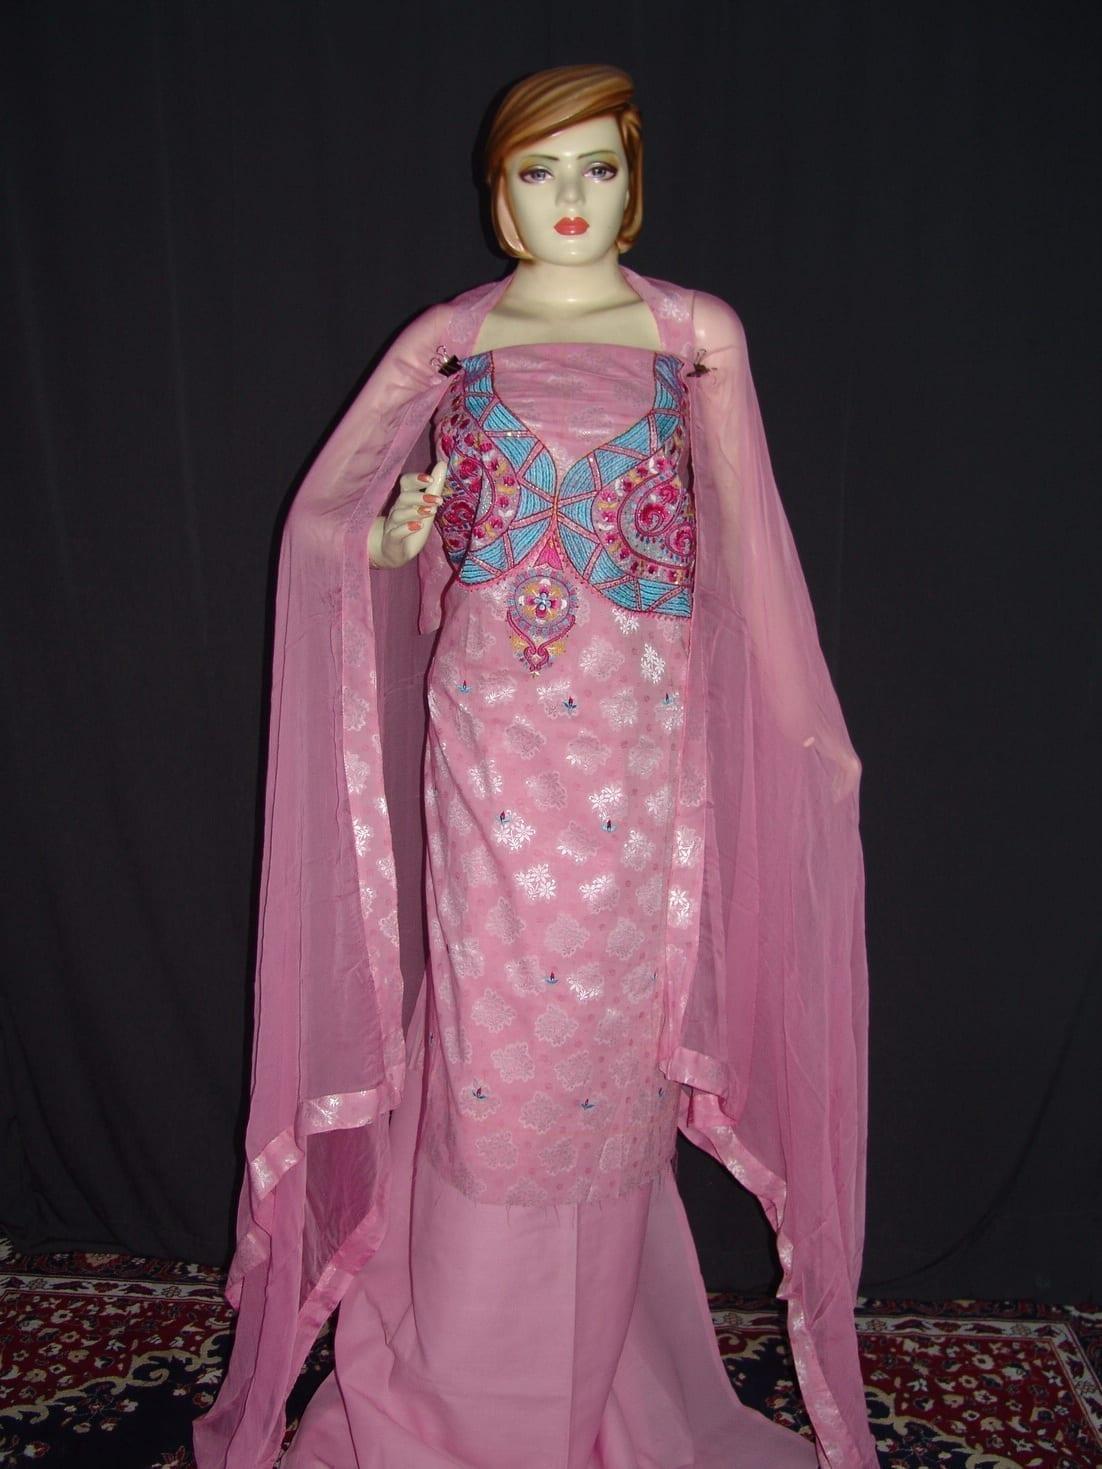 Self Print Cotton Embroidered Salwar Kameez Dupatta Suit RM128 1